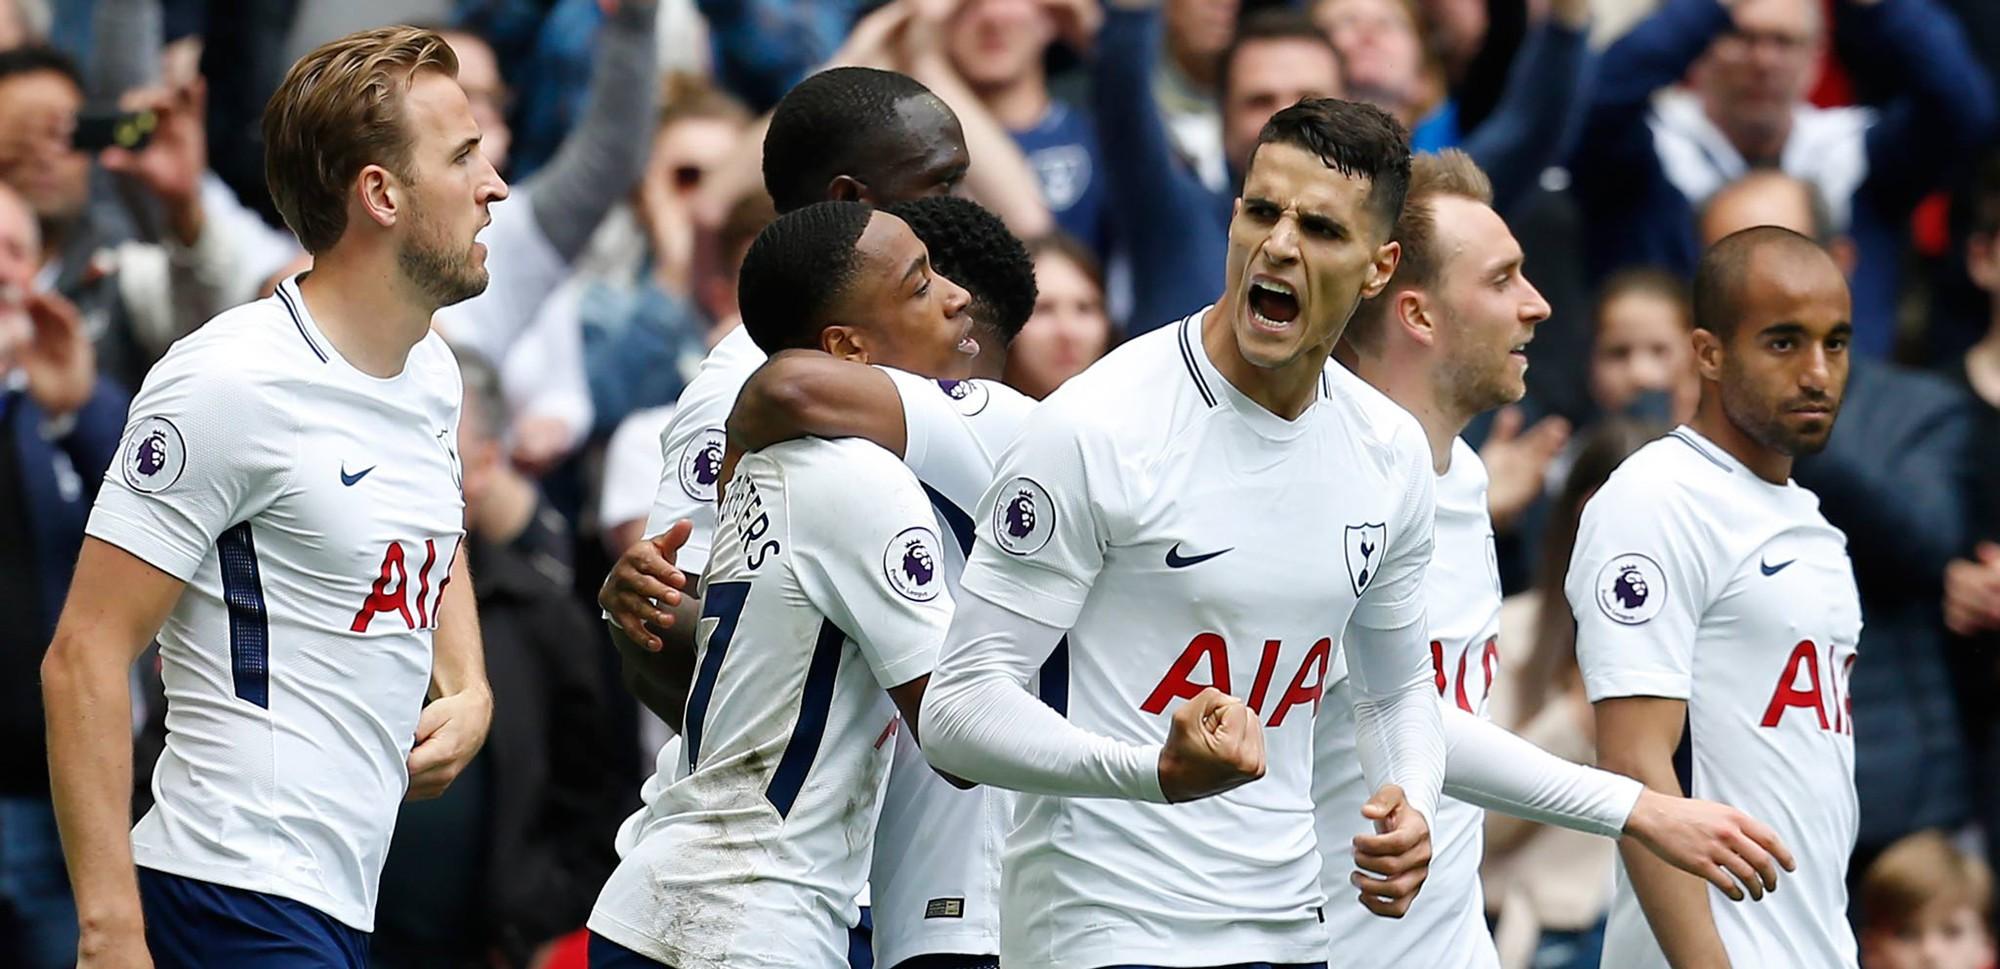 Tottenham - Truyện cổ kiểu Anh - Ảnh 2.